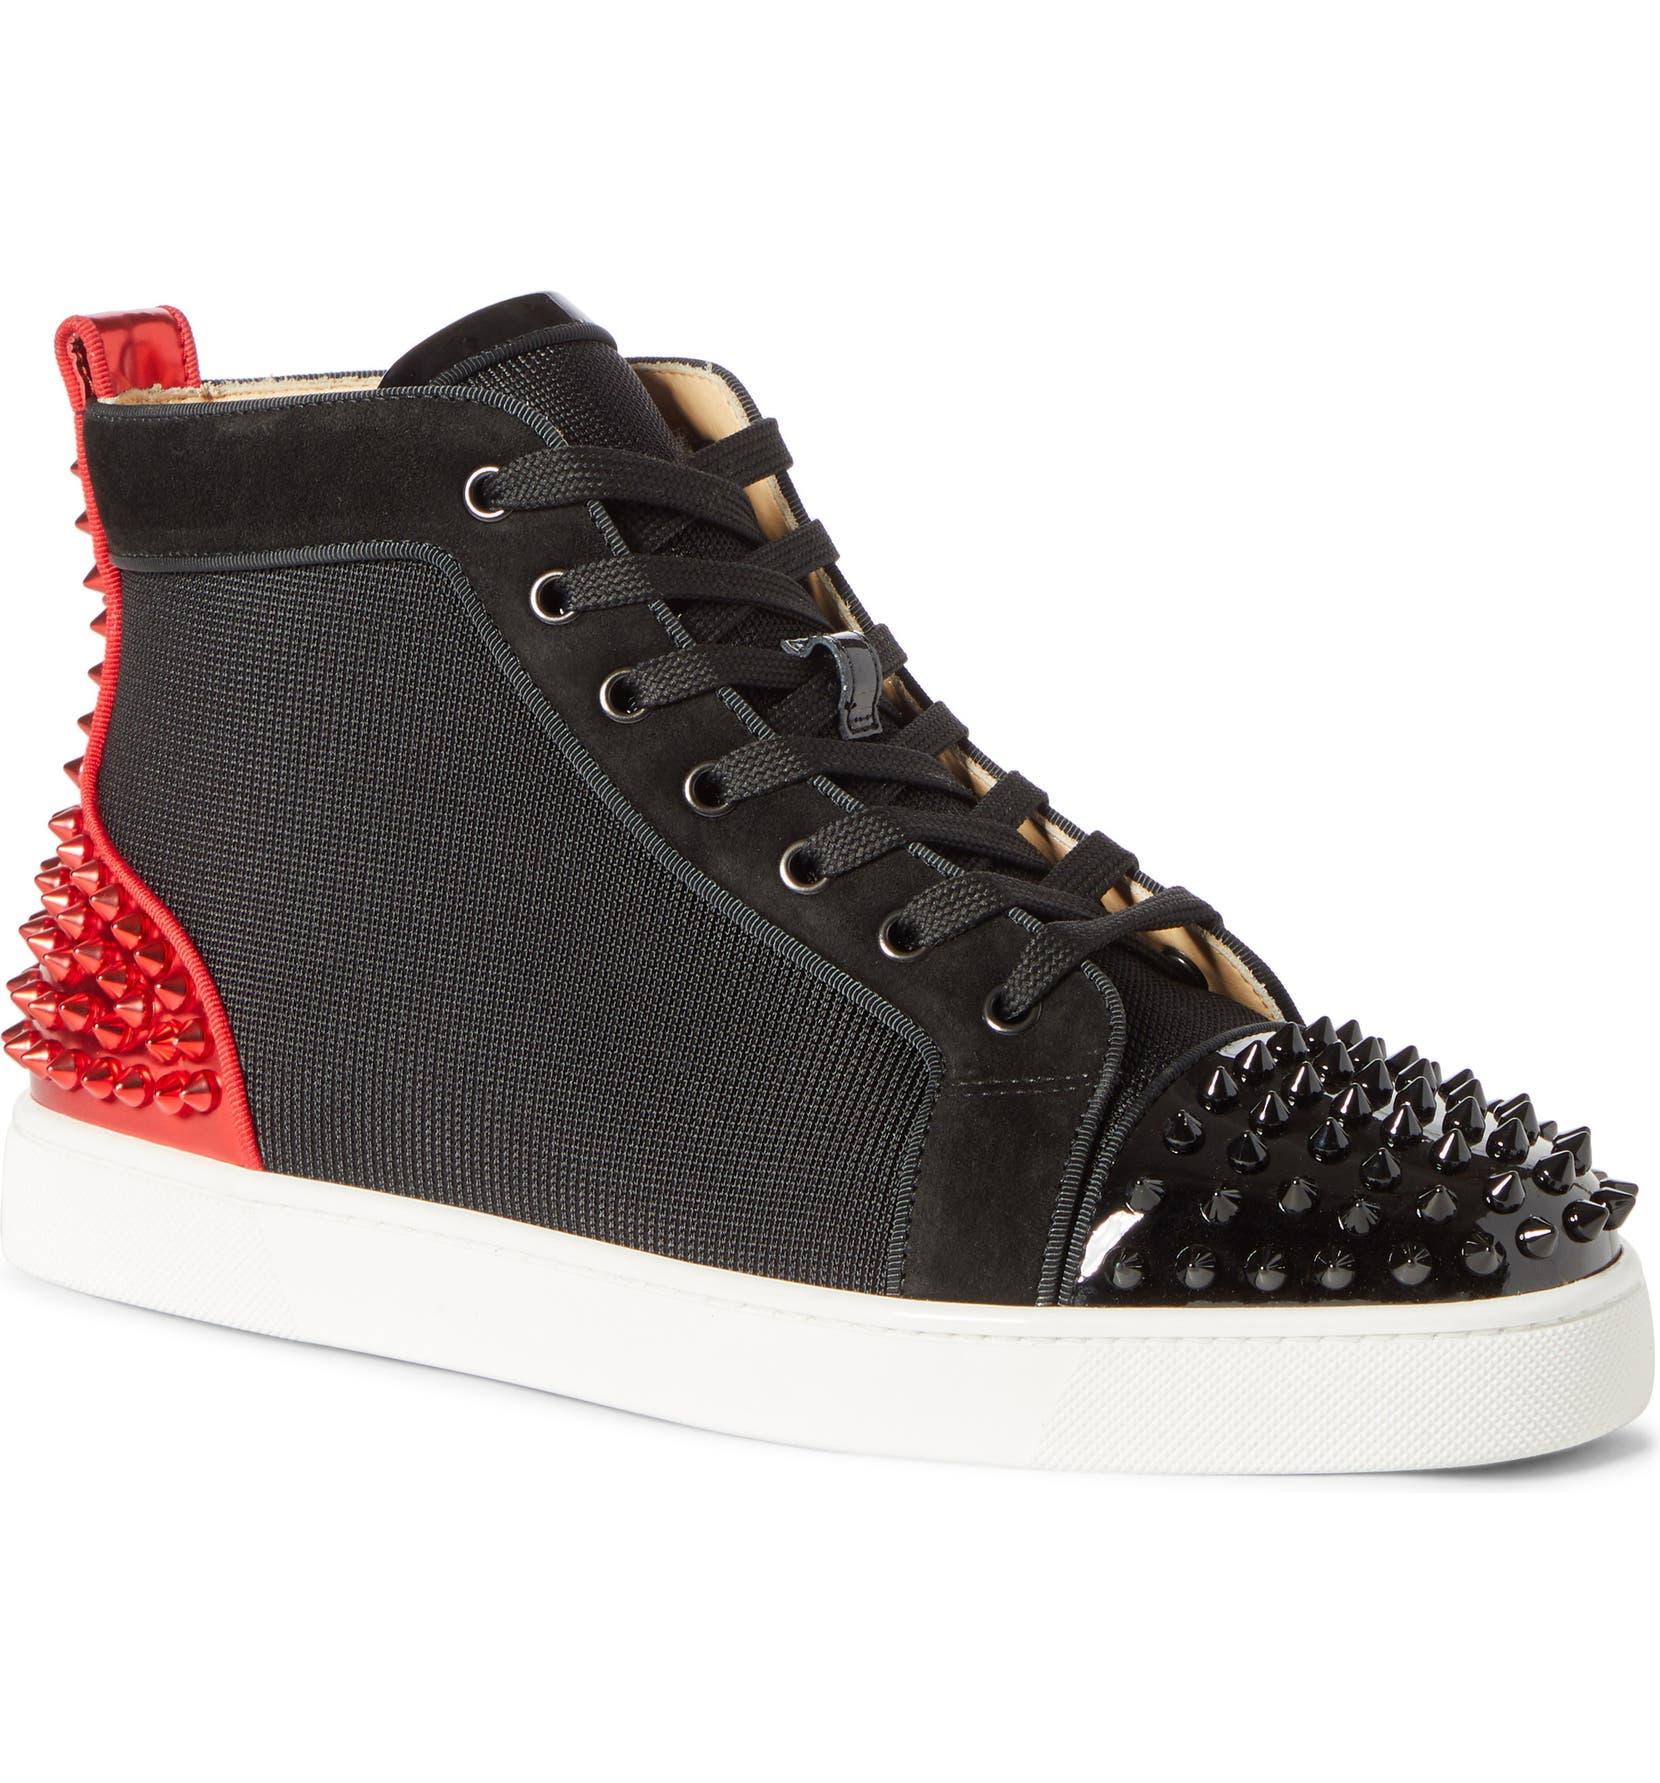 9c4cc3e00f6 Christian Louboutin AC Lou Spikes 2 High Top Sneaker (Men) | Nordstrom